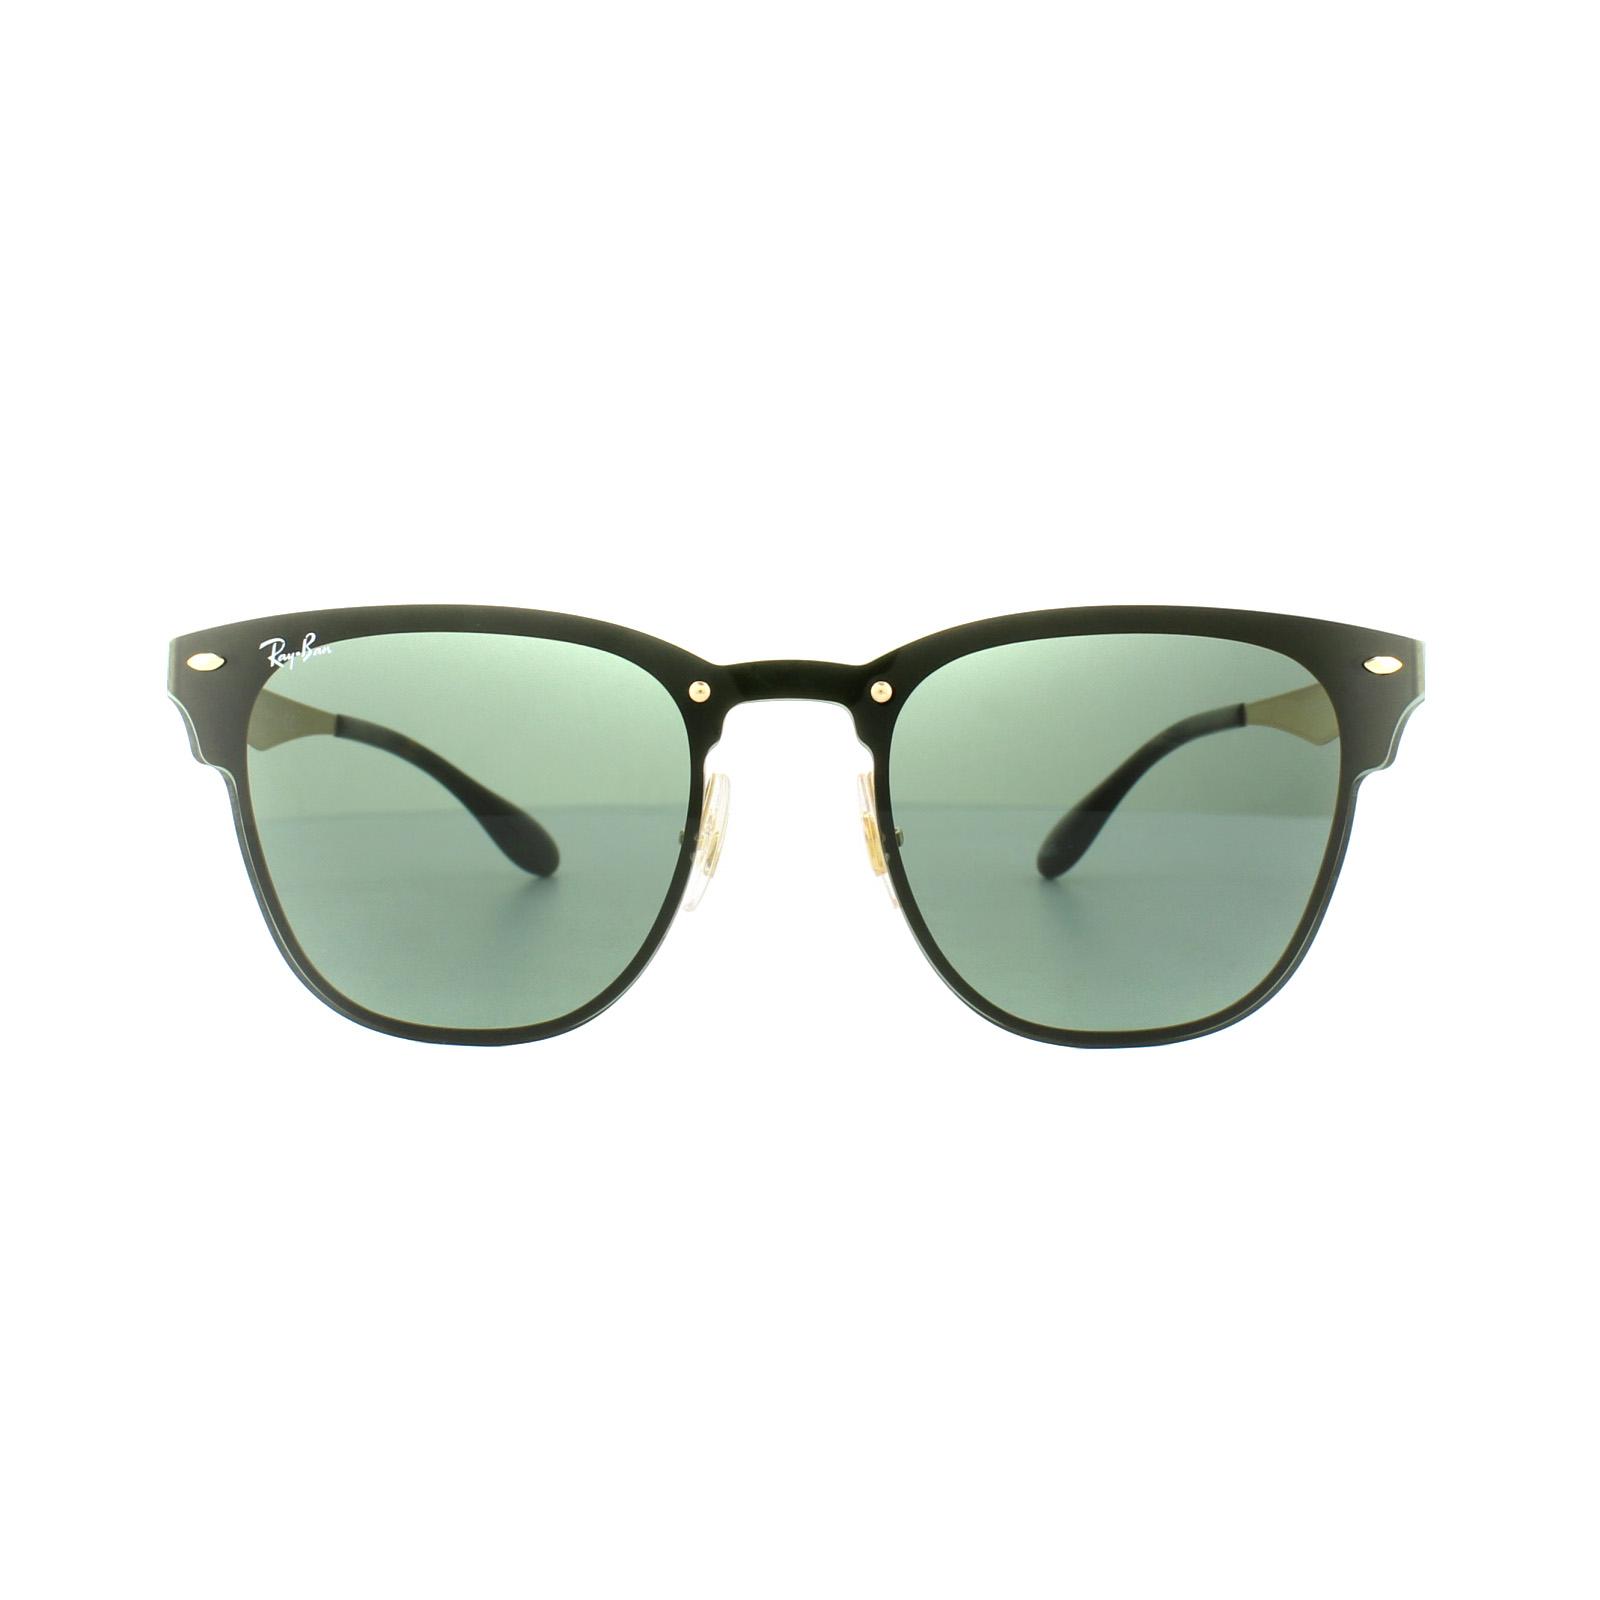 a856ae90f73c4 Sentinel Ray-Ban Sunglasses Blaze Clubmaster 3576N 043 71 Gold Green